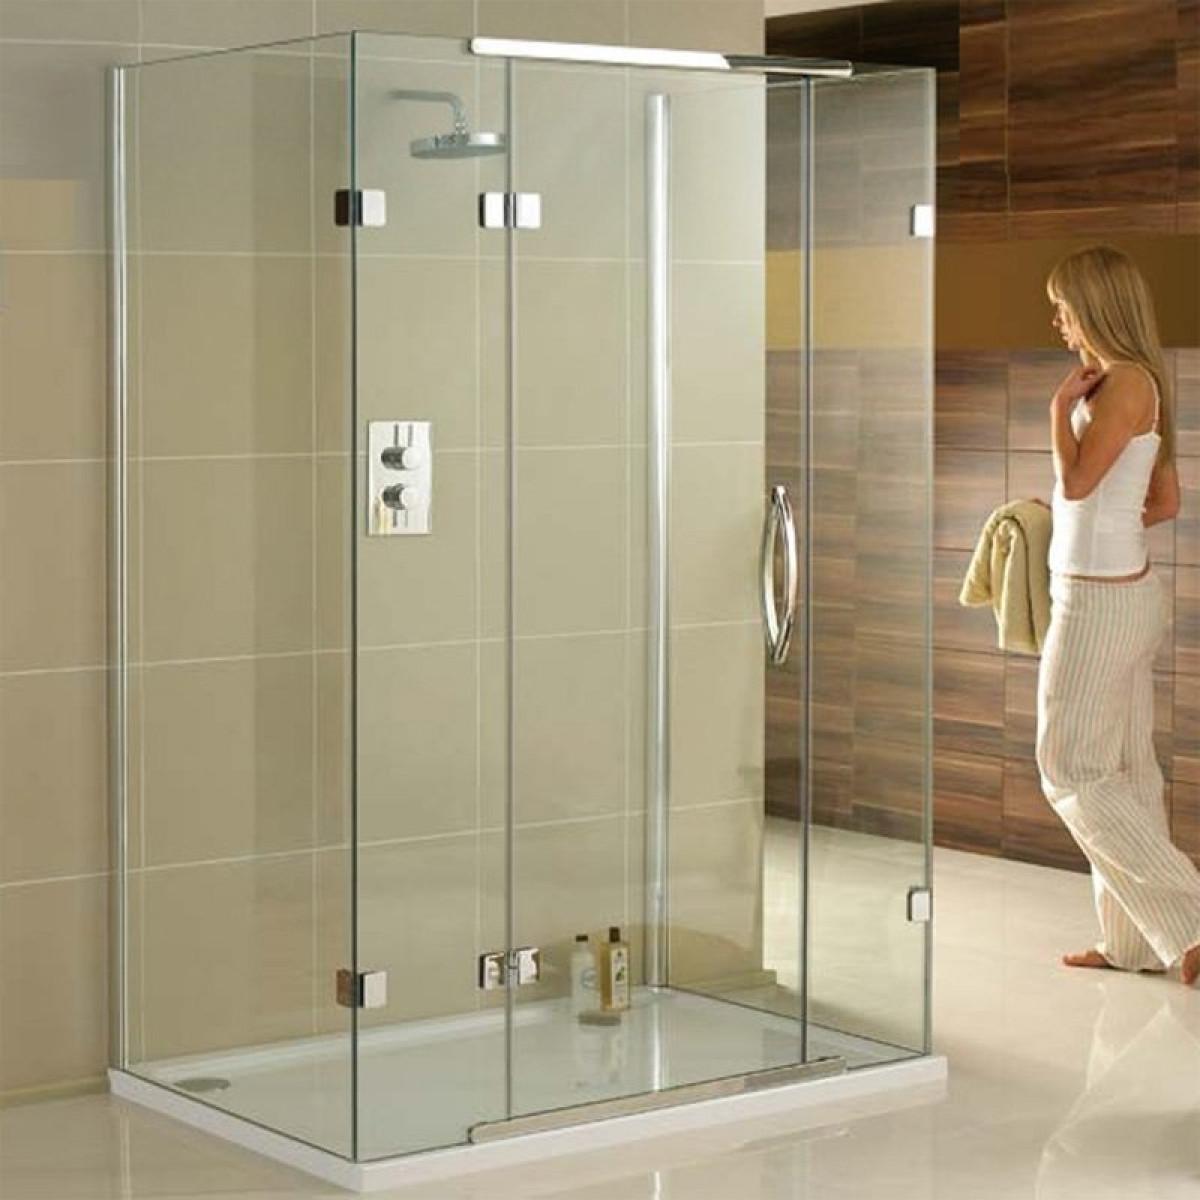 Aquadart 1200 X 900mm 3 Sided Shower Enclosure